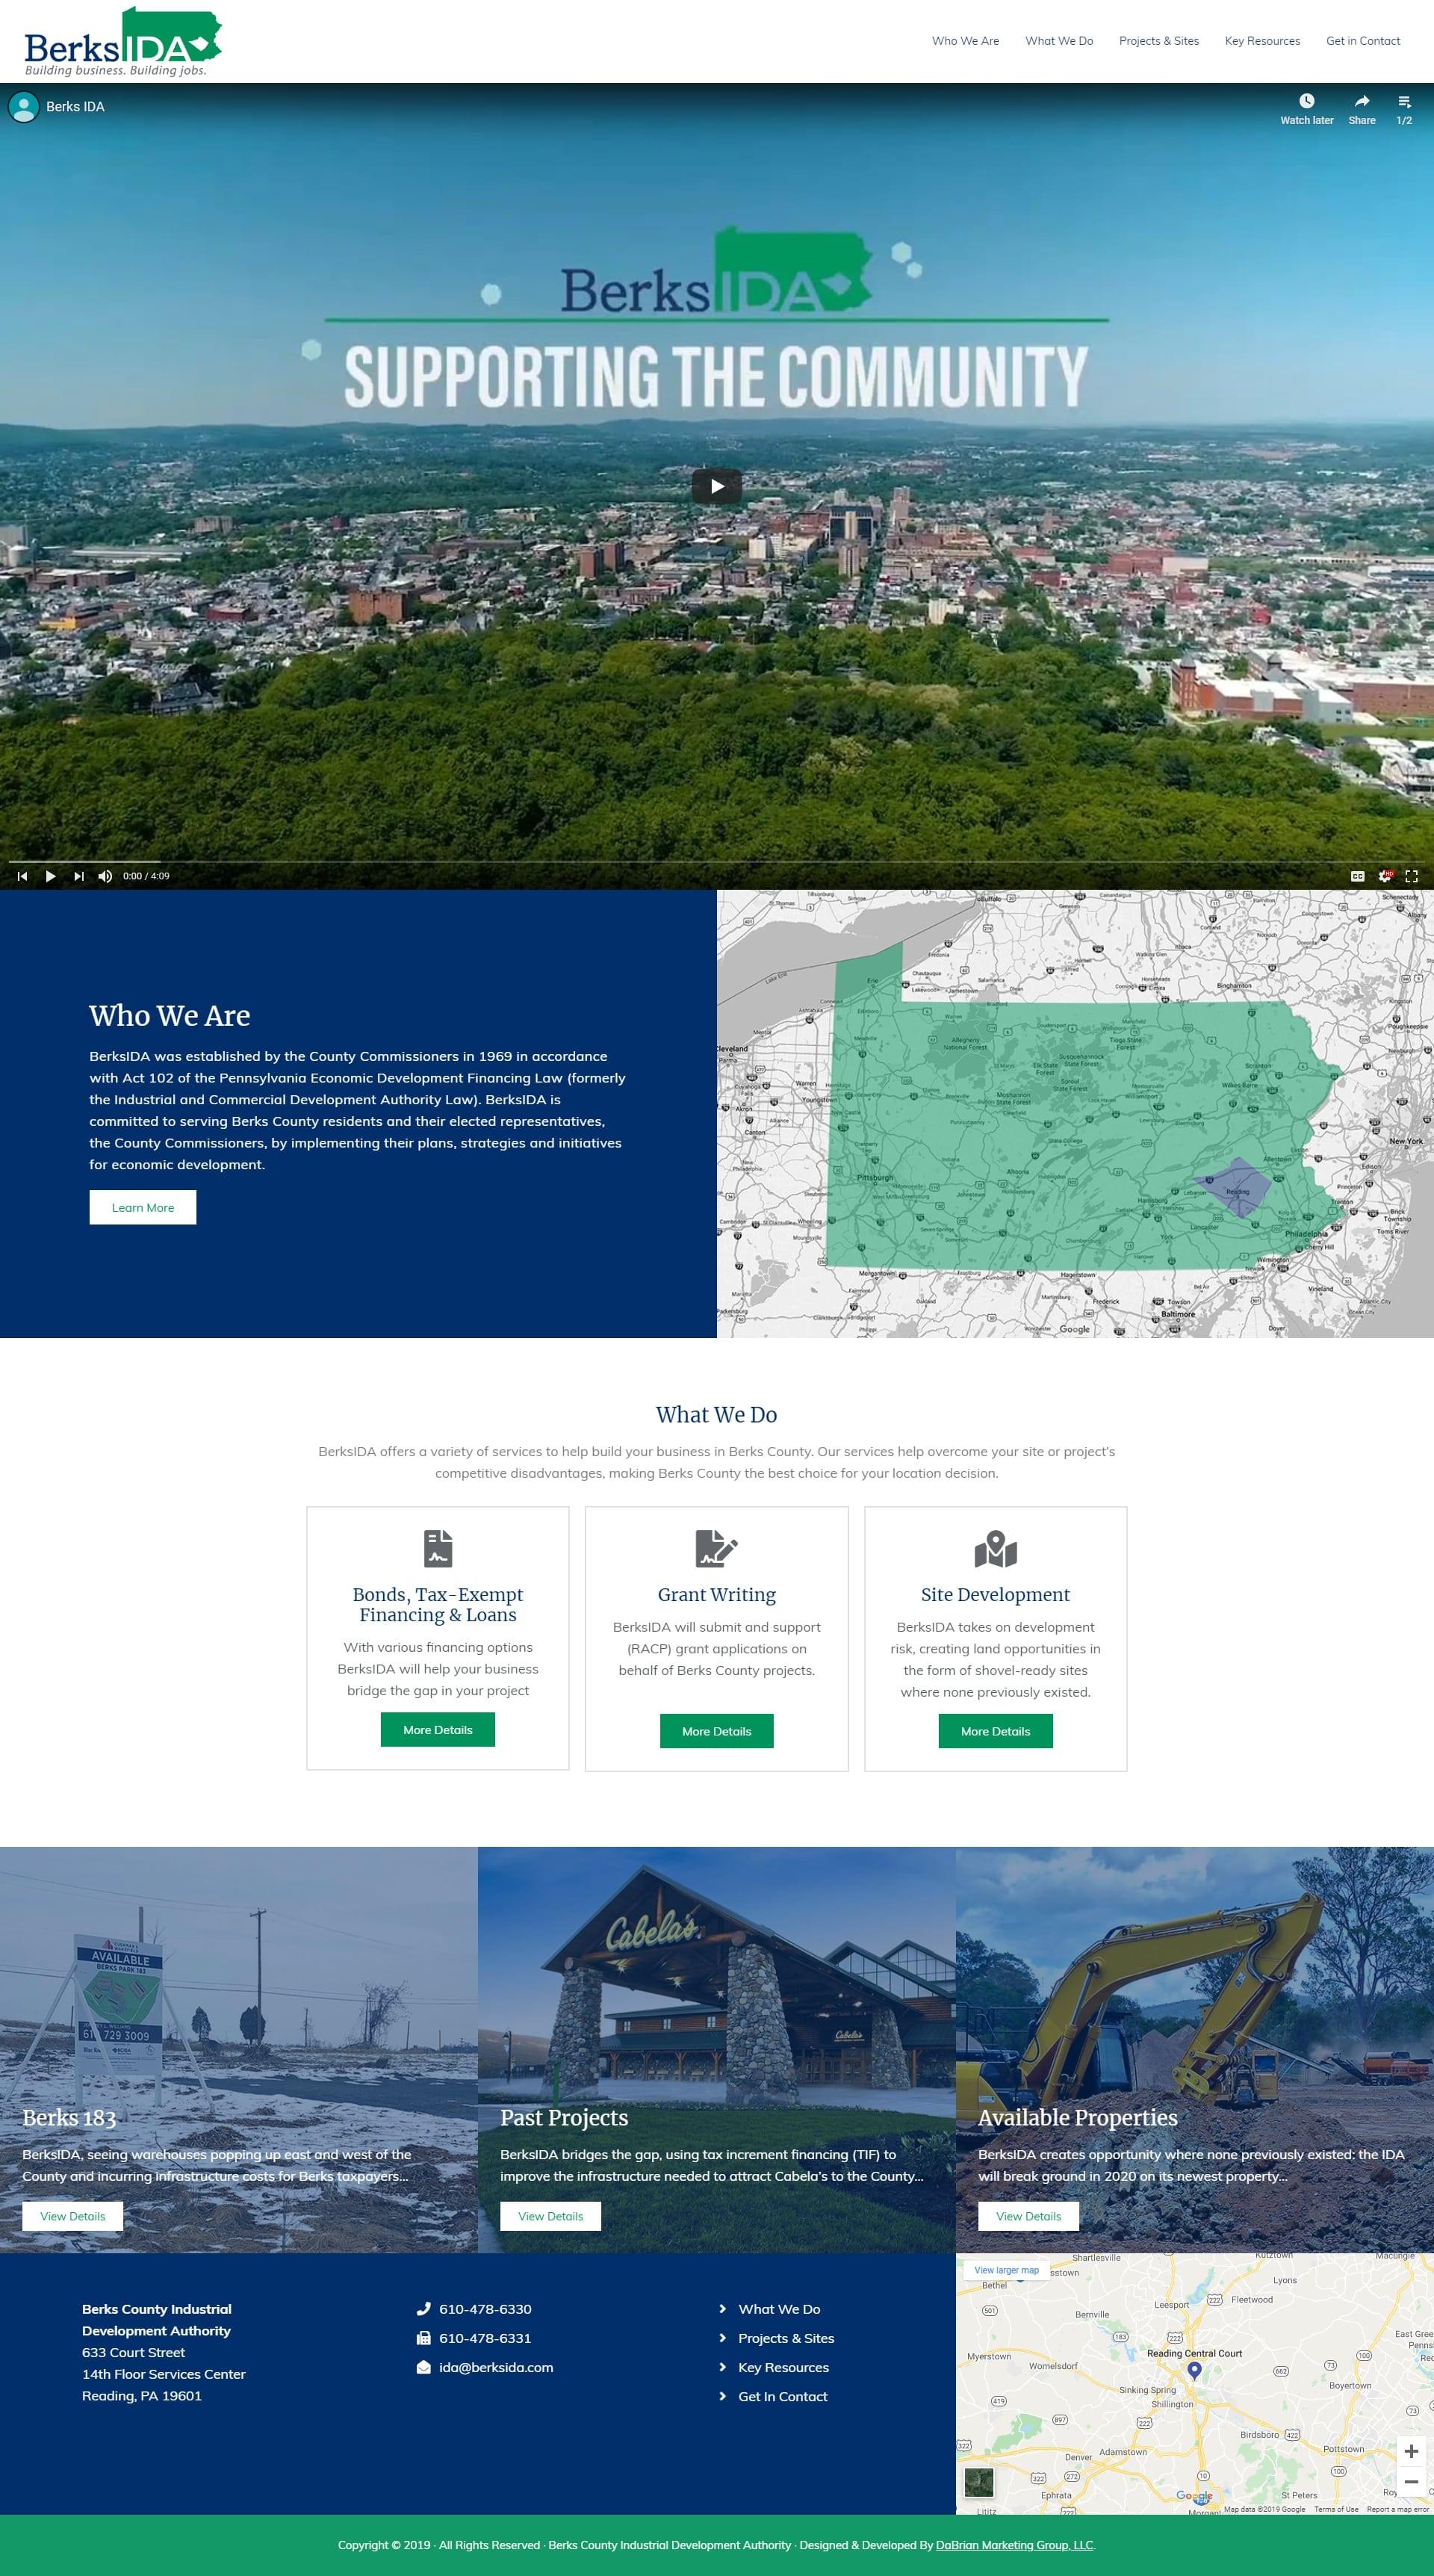 Berks County Industrial Development Authority (BerksIDA) New website and logo